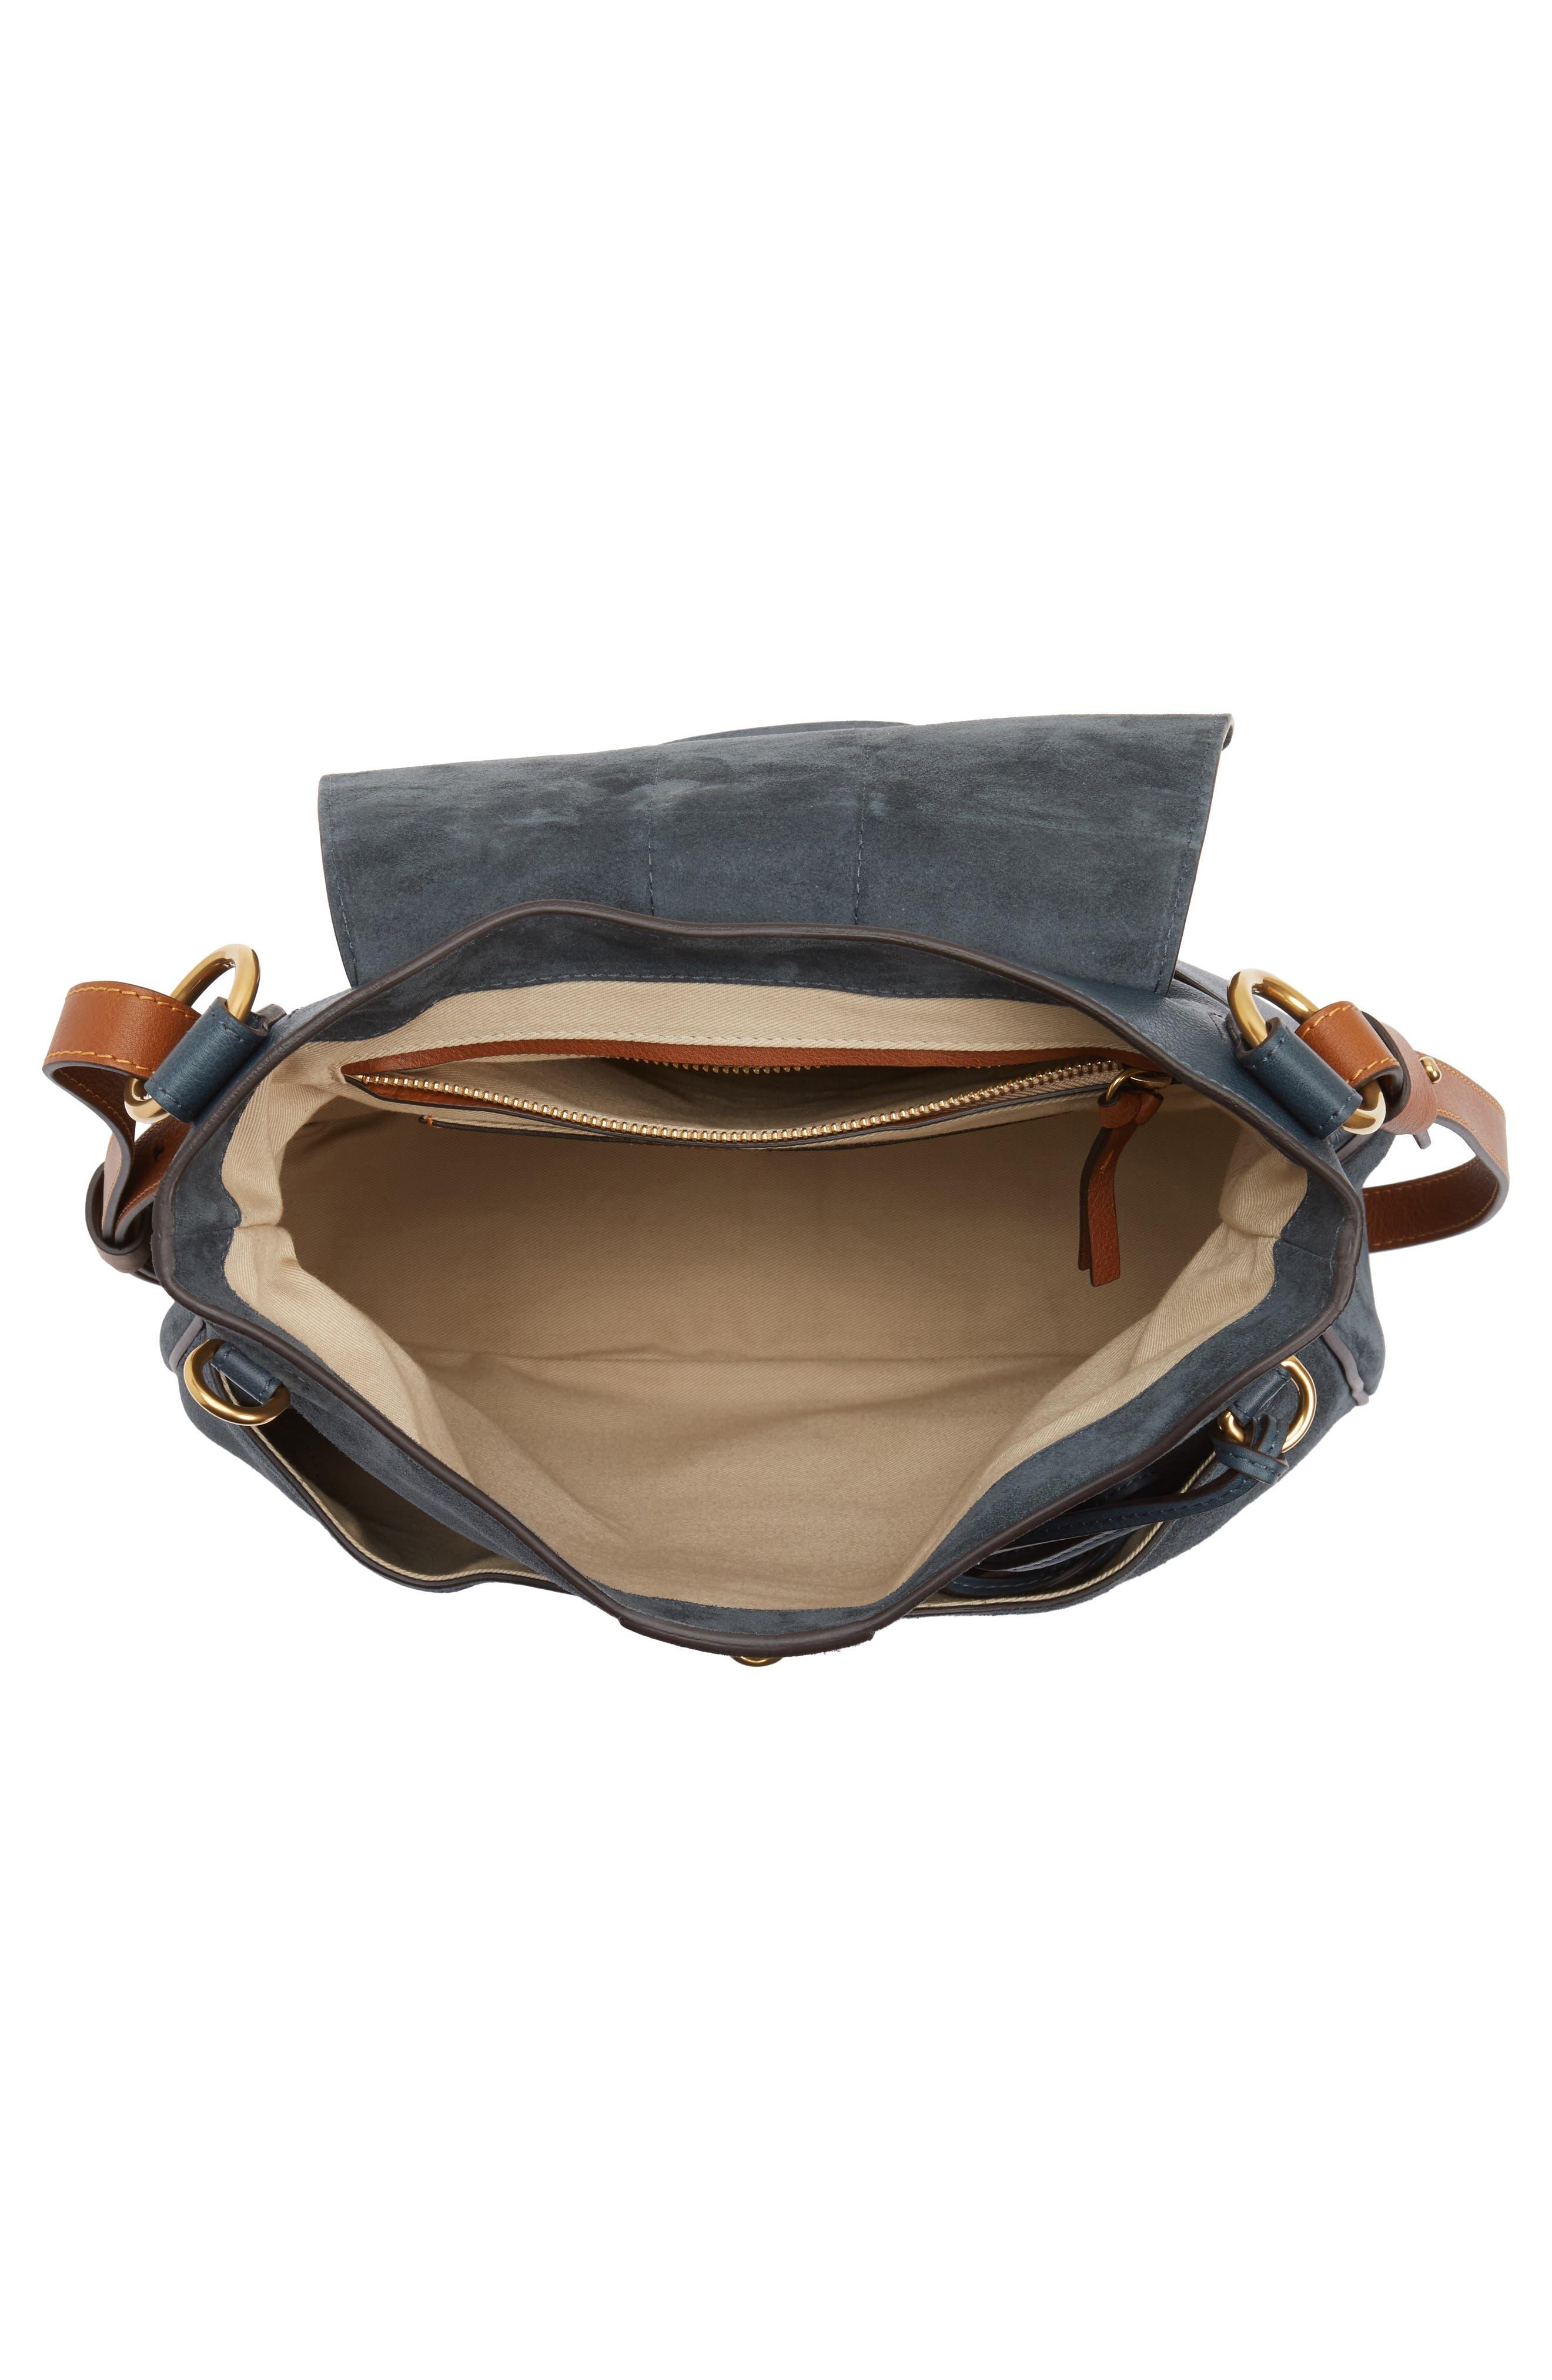 Medium Lexa Leather Shoulder Bag,                             Alternate thumbnail 8, color,